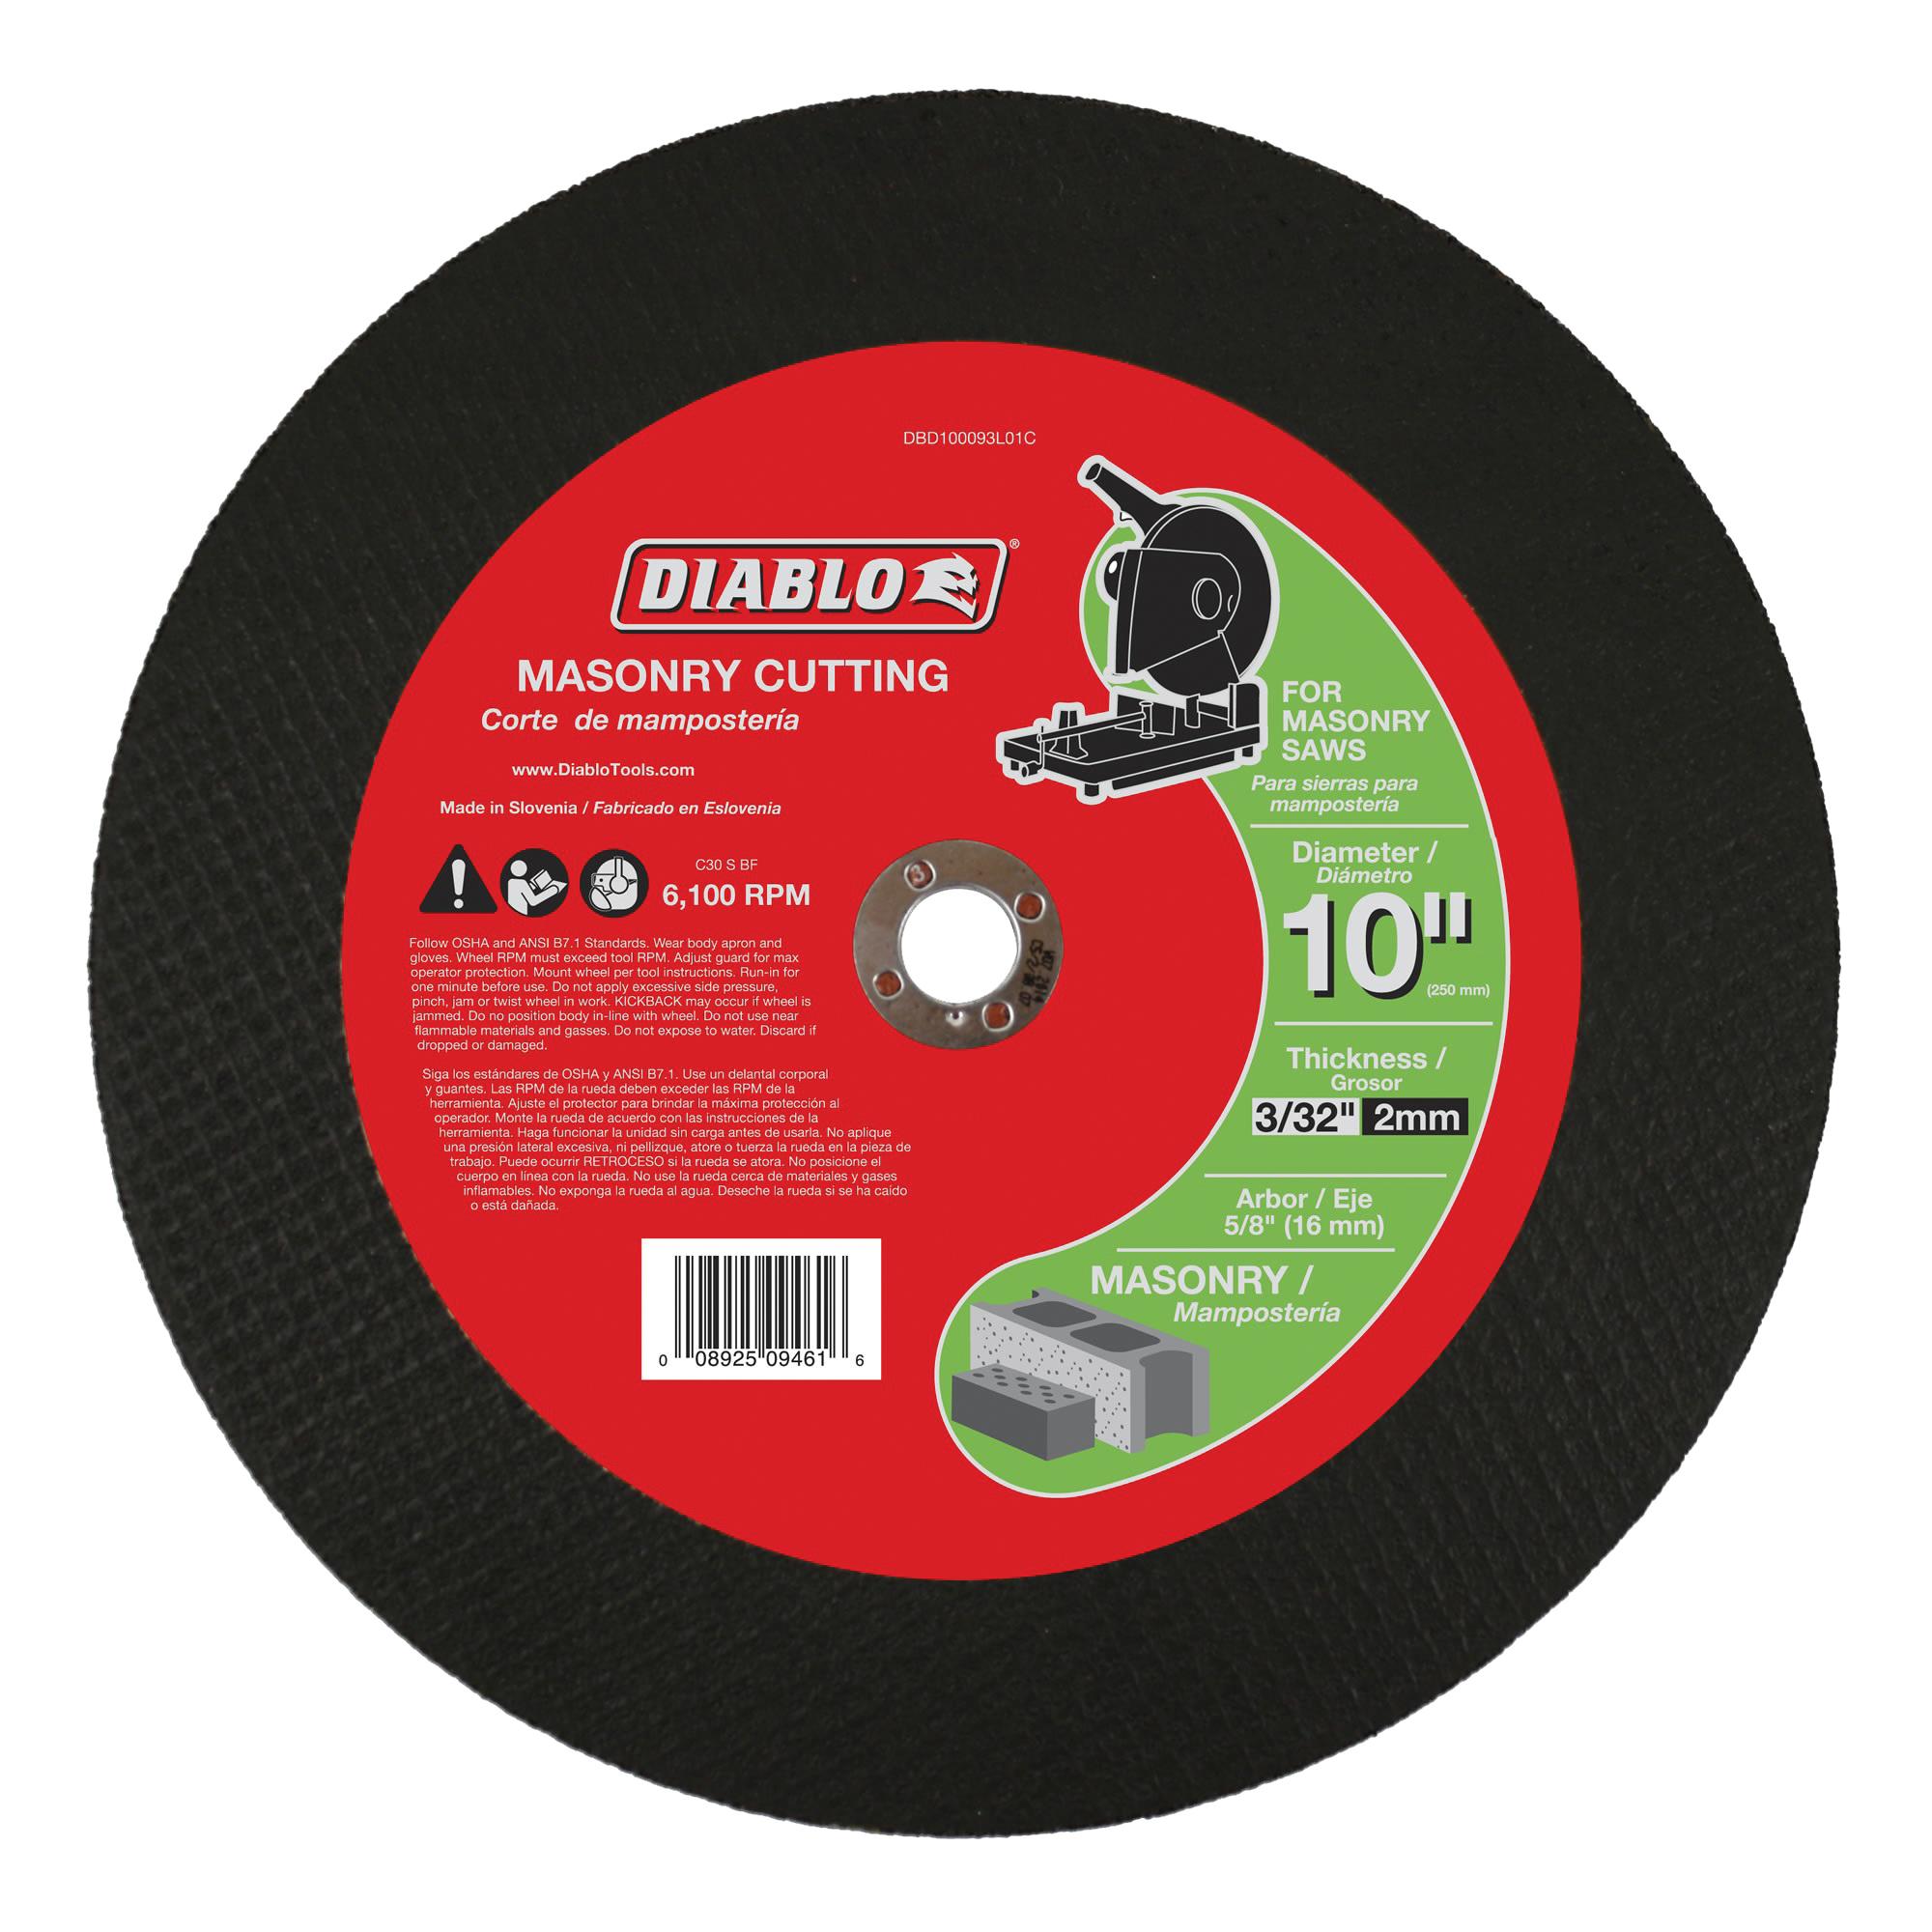 Picture of Diablo DBD100093L01C Cut-Off Disc, 10 in Dia, 3/32 in Thick, 5/8 in Arbor, Aluminum Oxide Abrasive